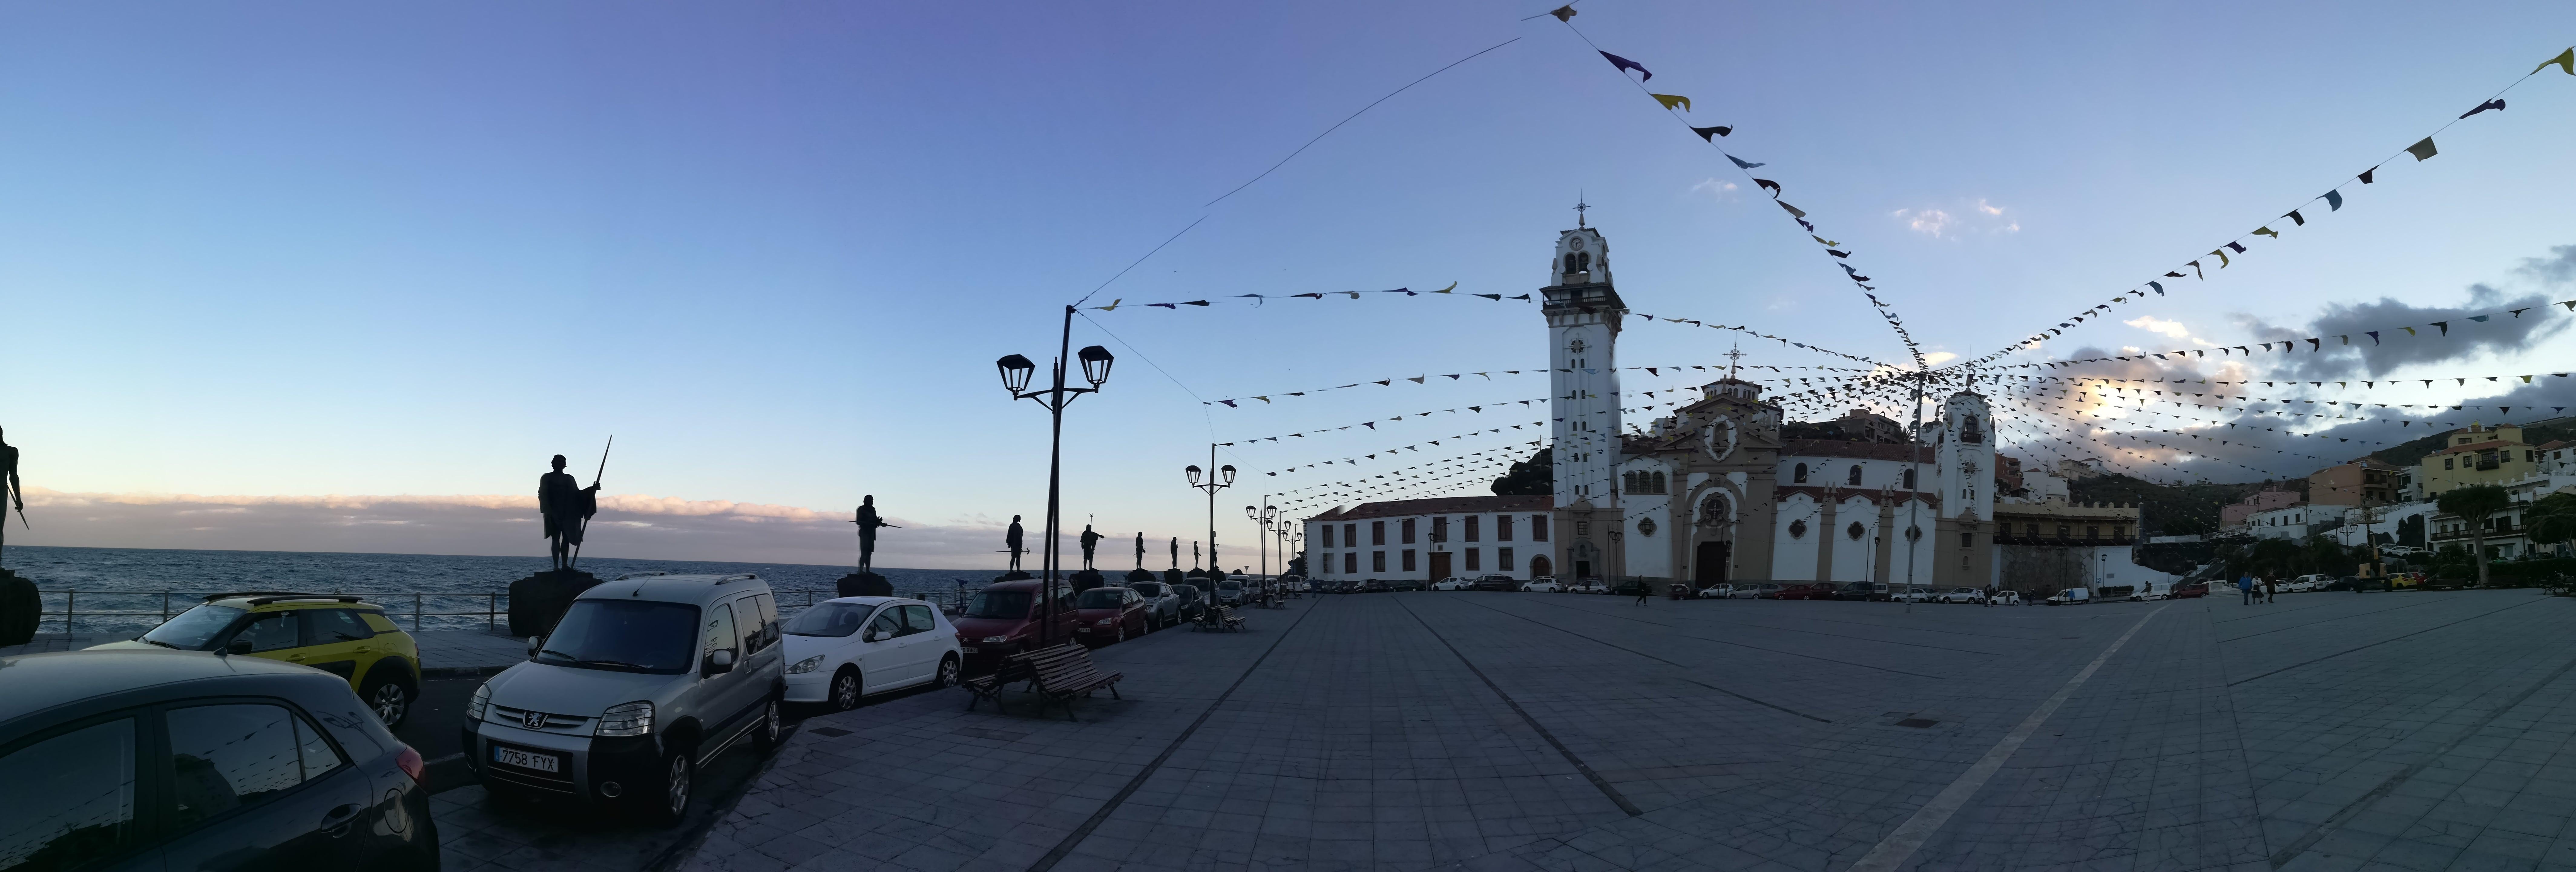 Candelaria Panorama